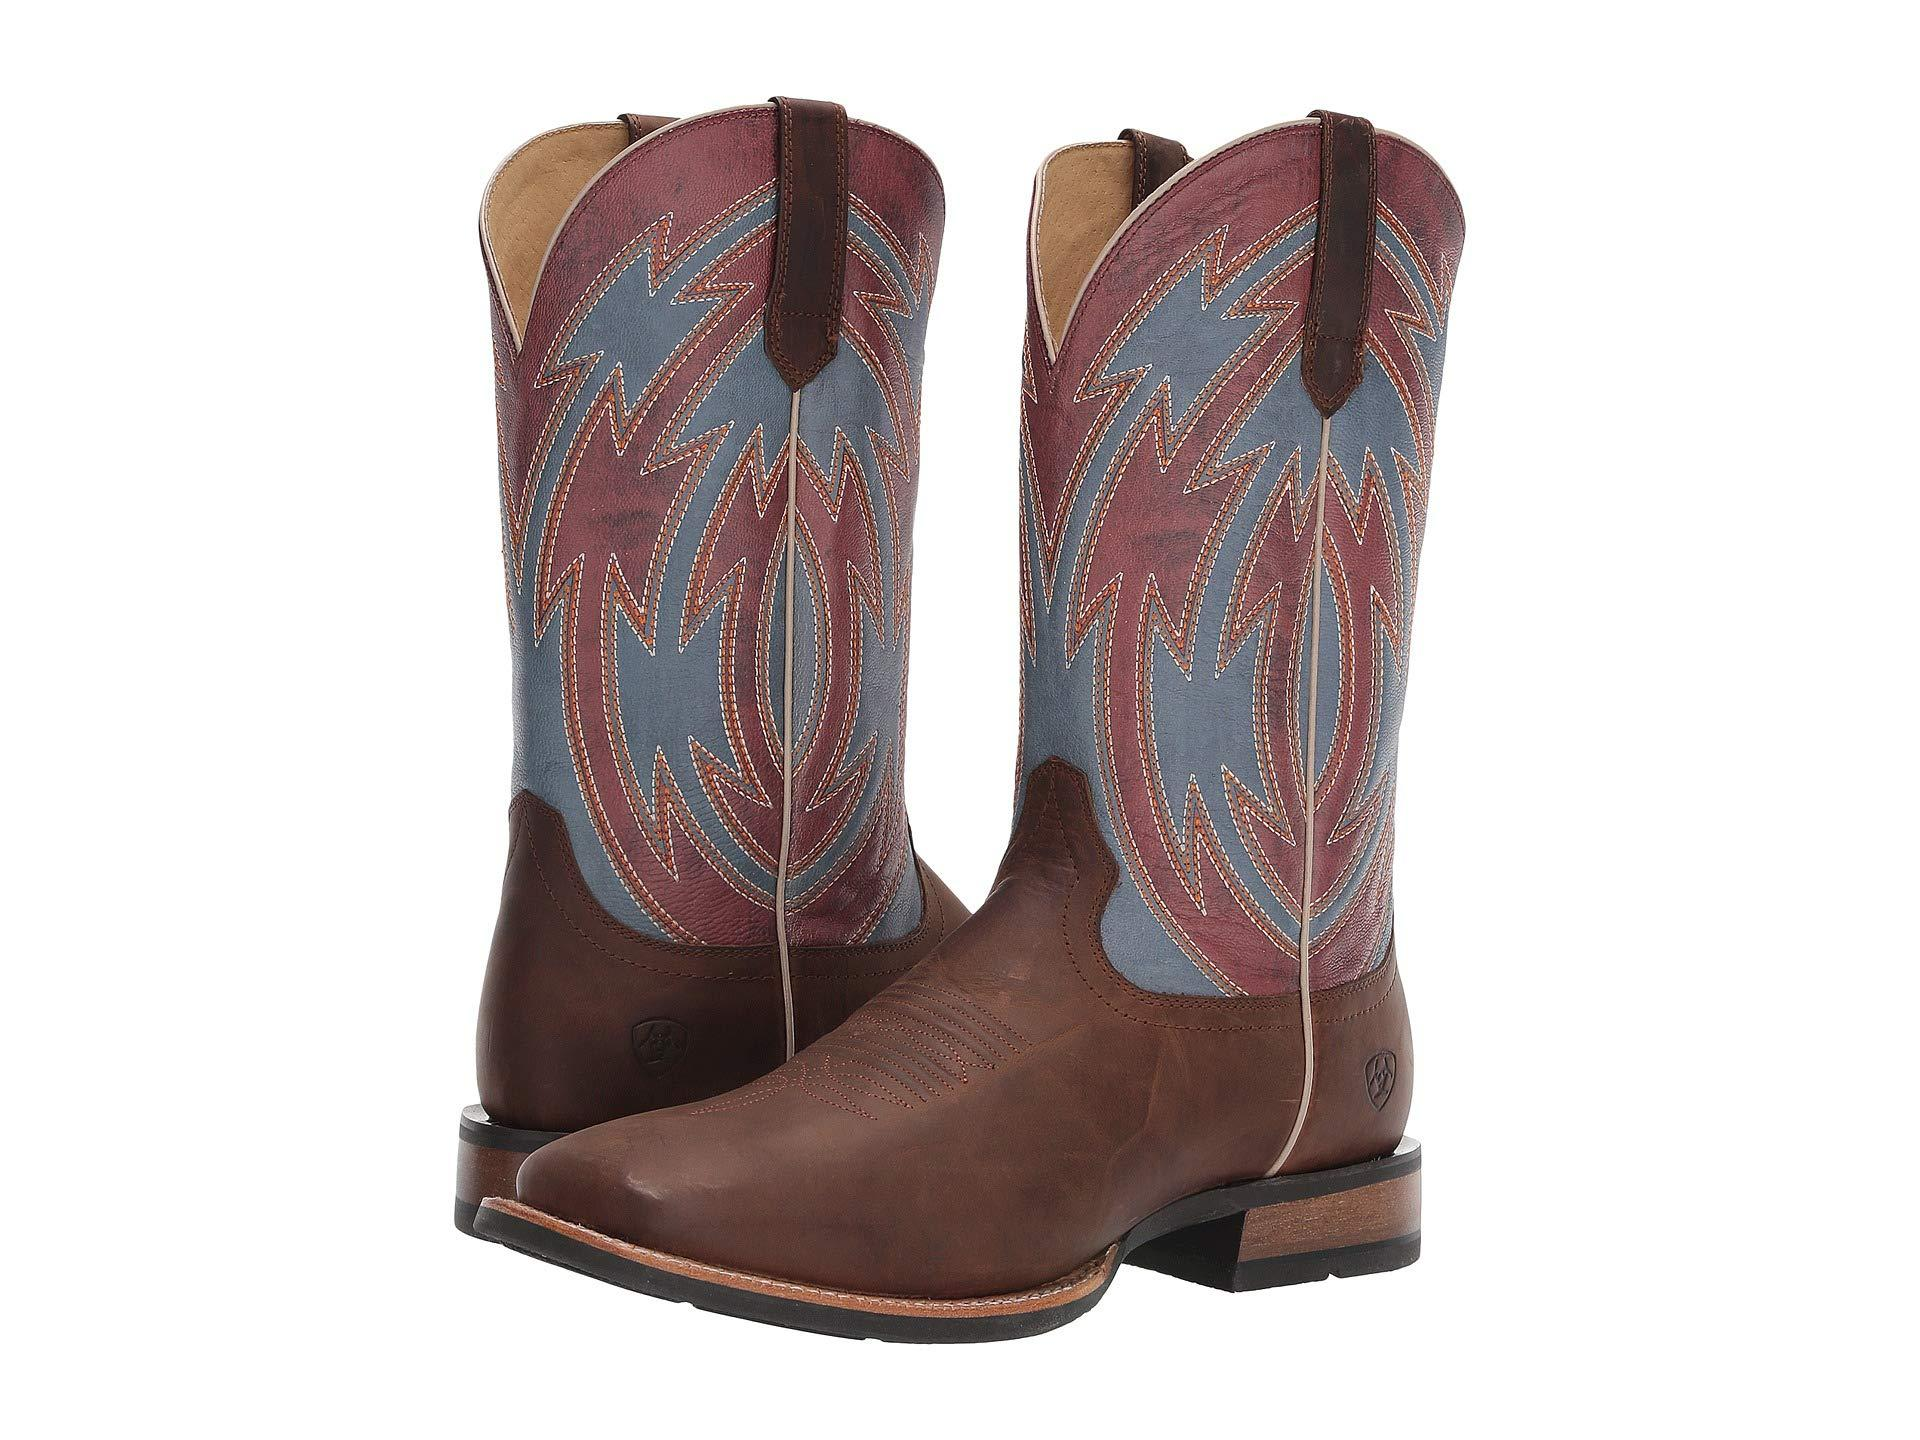 f8d8854fa13 Ariat - Multicolor Crossdraw (ox Blood/blue Fireball) Cowboy Boots for Men  - Lyst